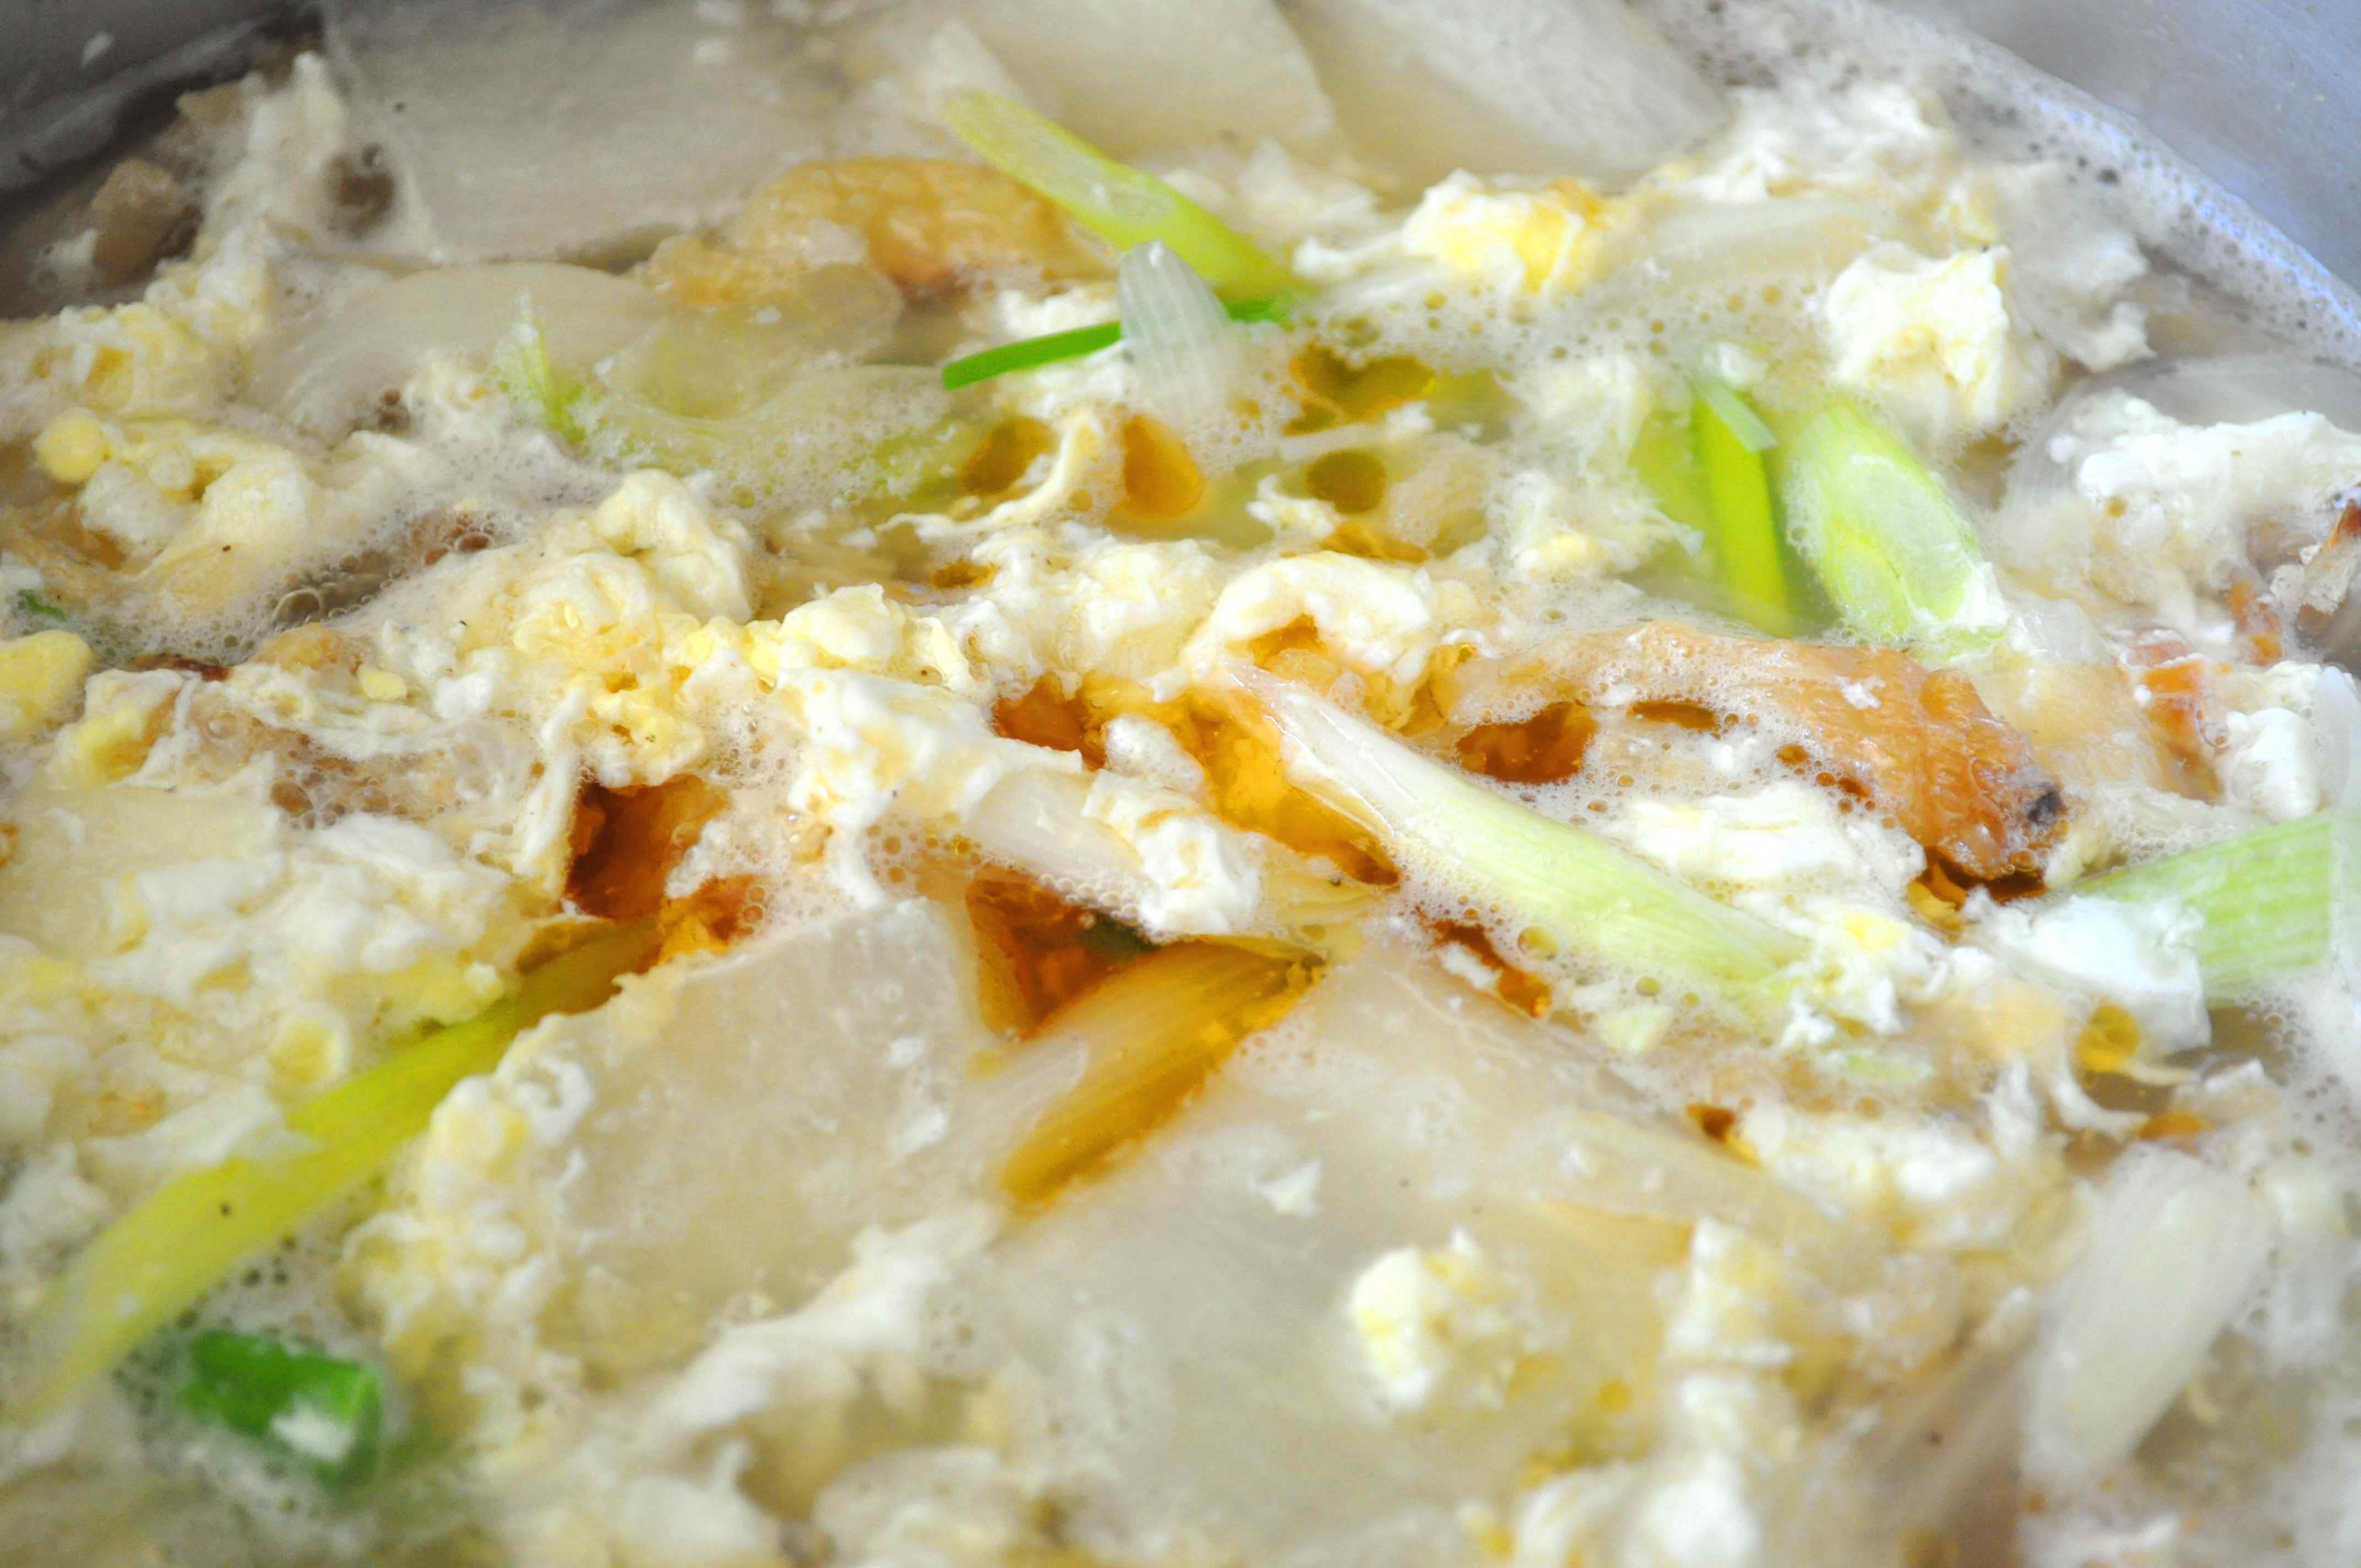 bugeo gook with sesame oil